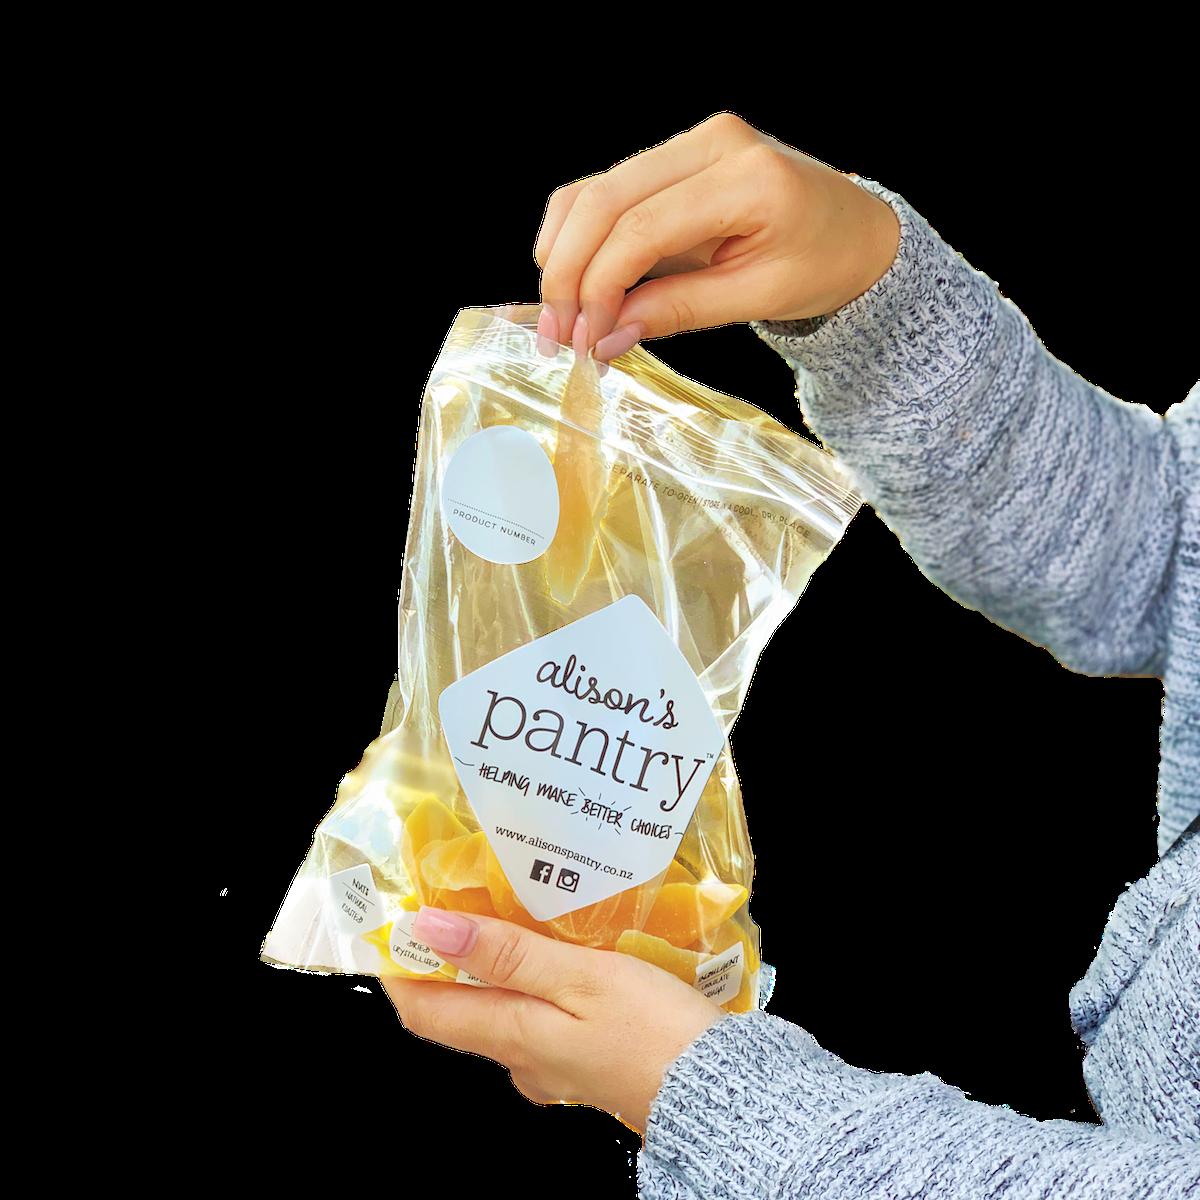 Foodstuffs & Alison's Pantry paper bag trial_hand in existing AP bag